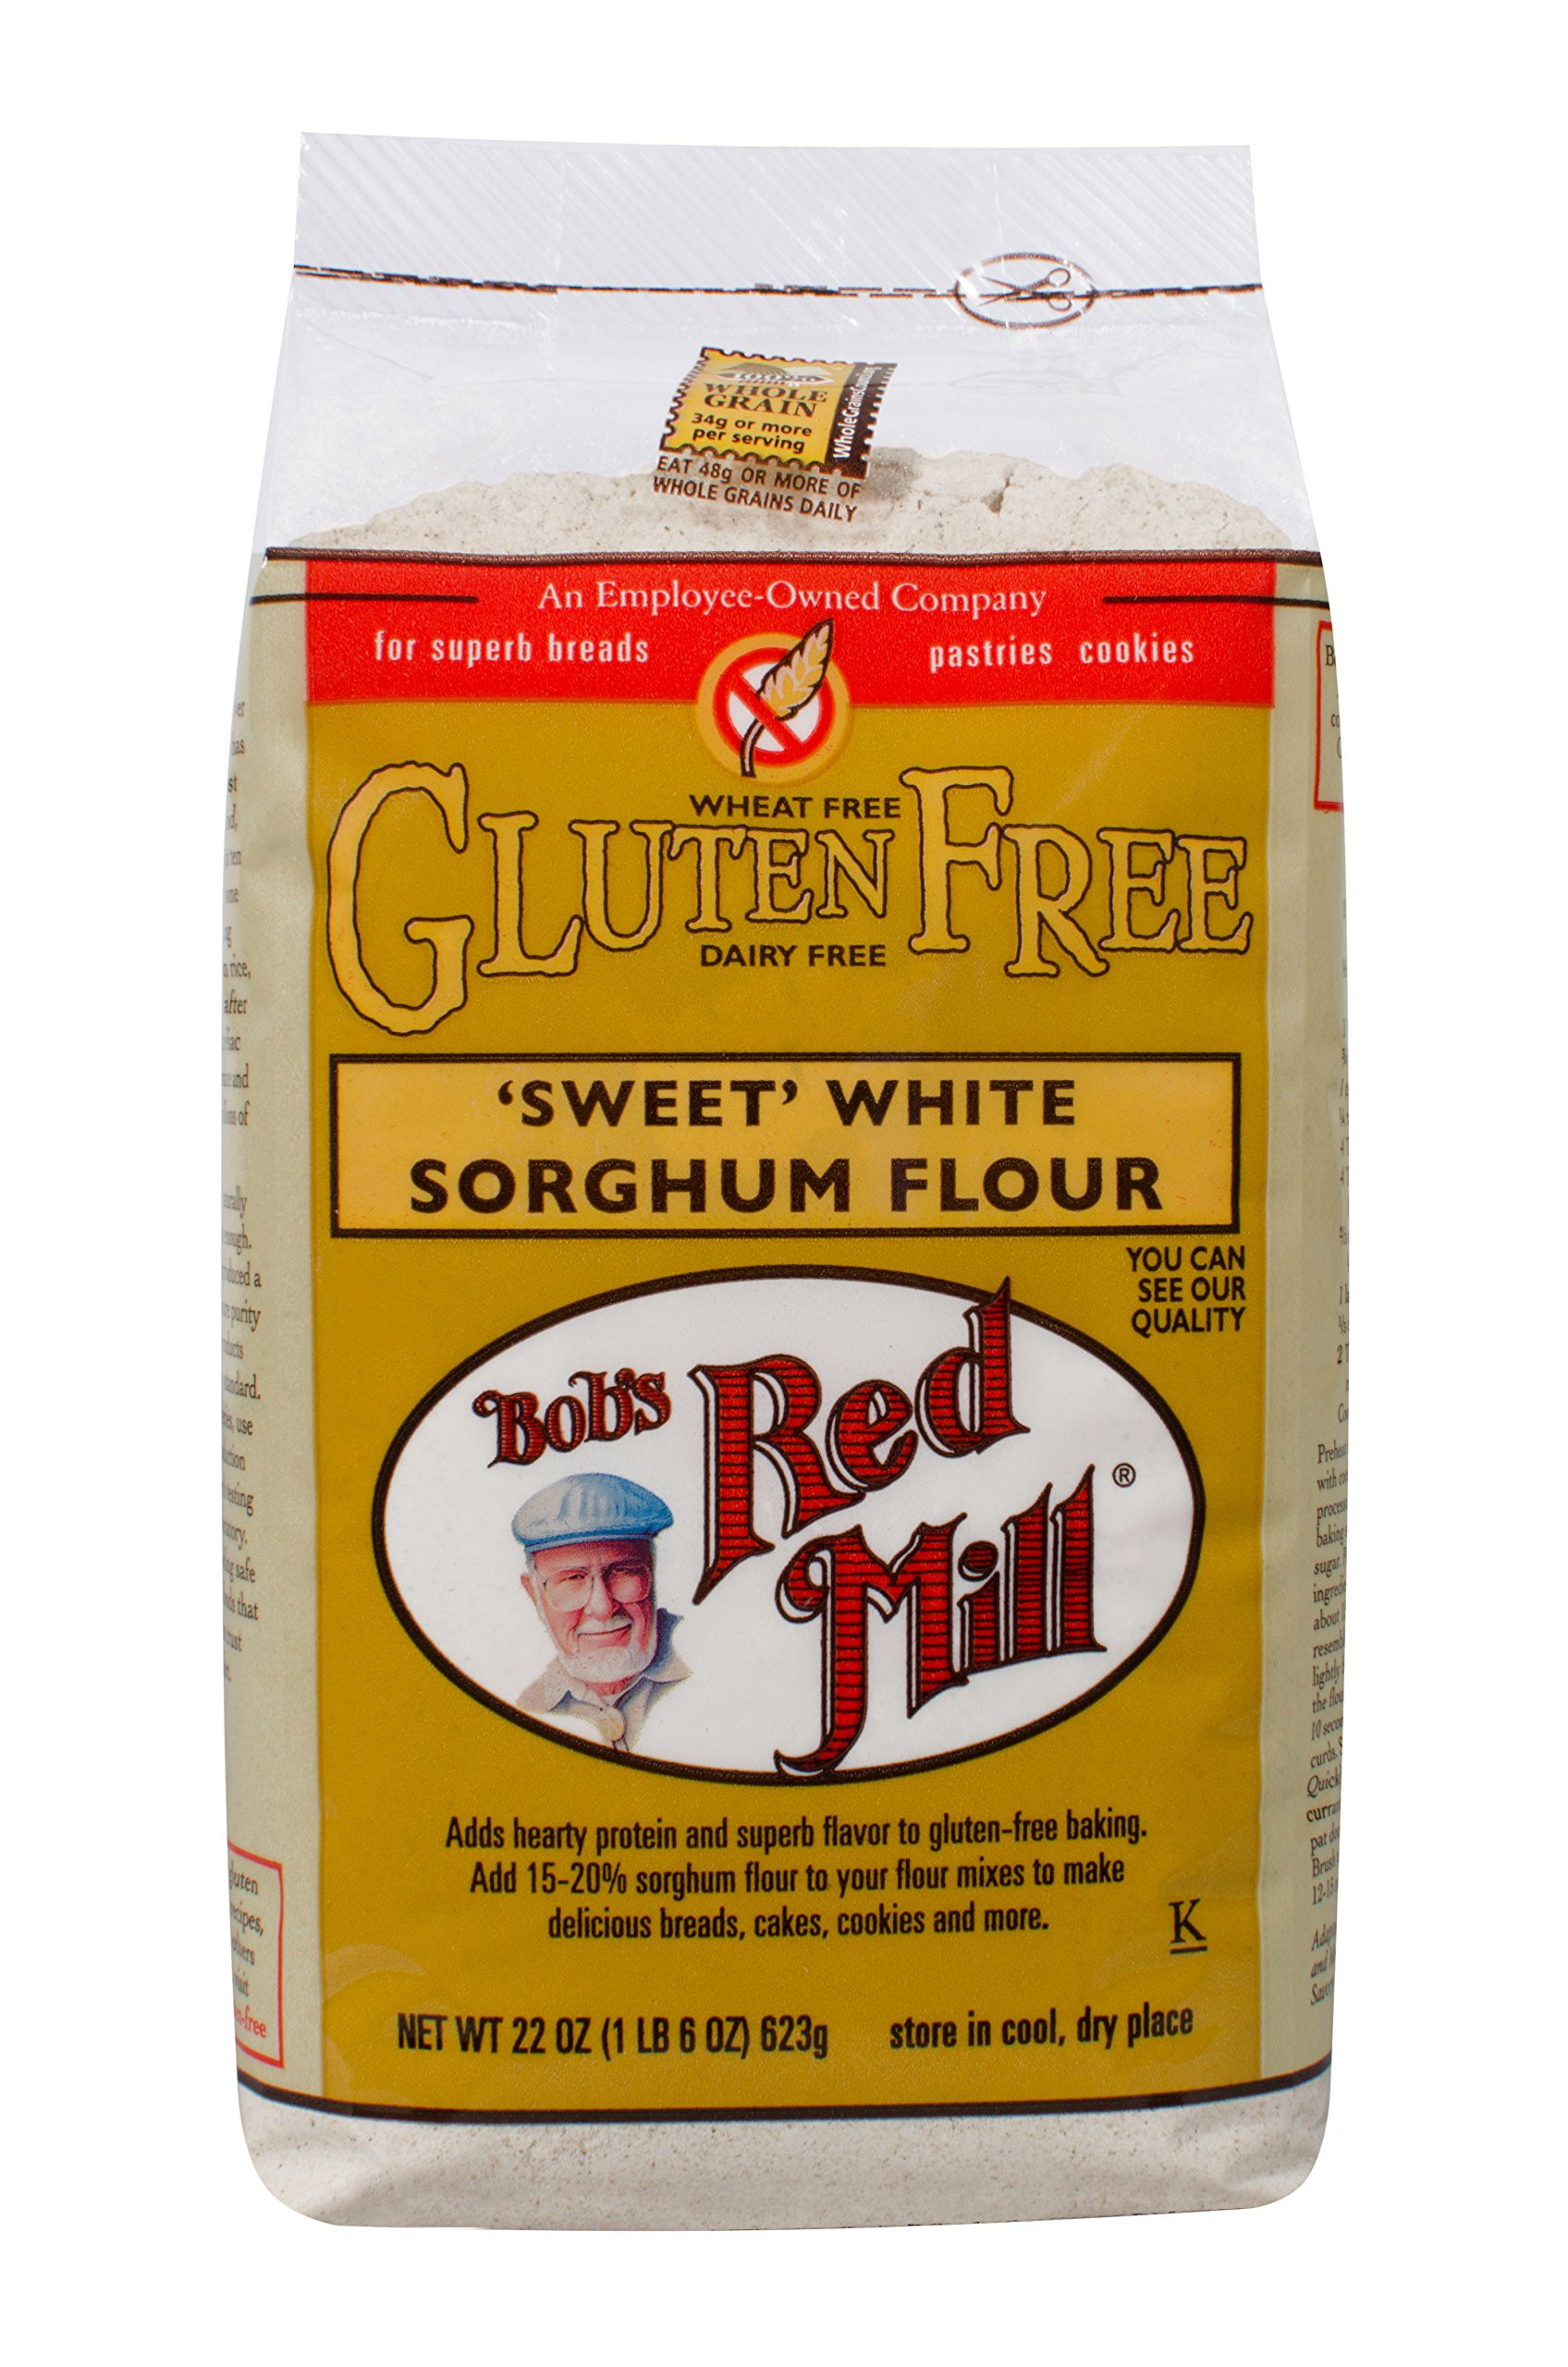 Bob'S Red Mill Potato Starch  Amazon Bob s Red Mill Potato Starch 24 ounce Pack